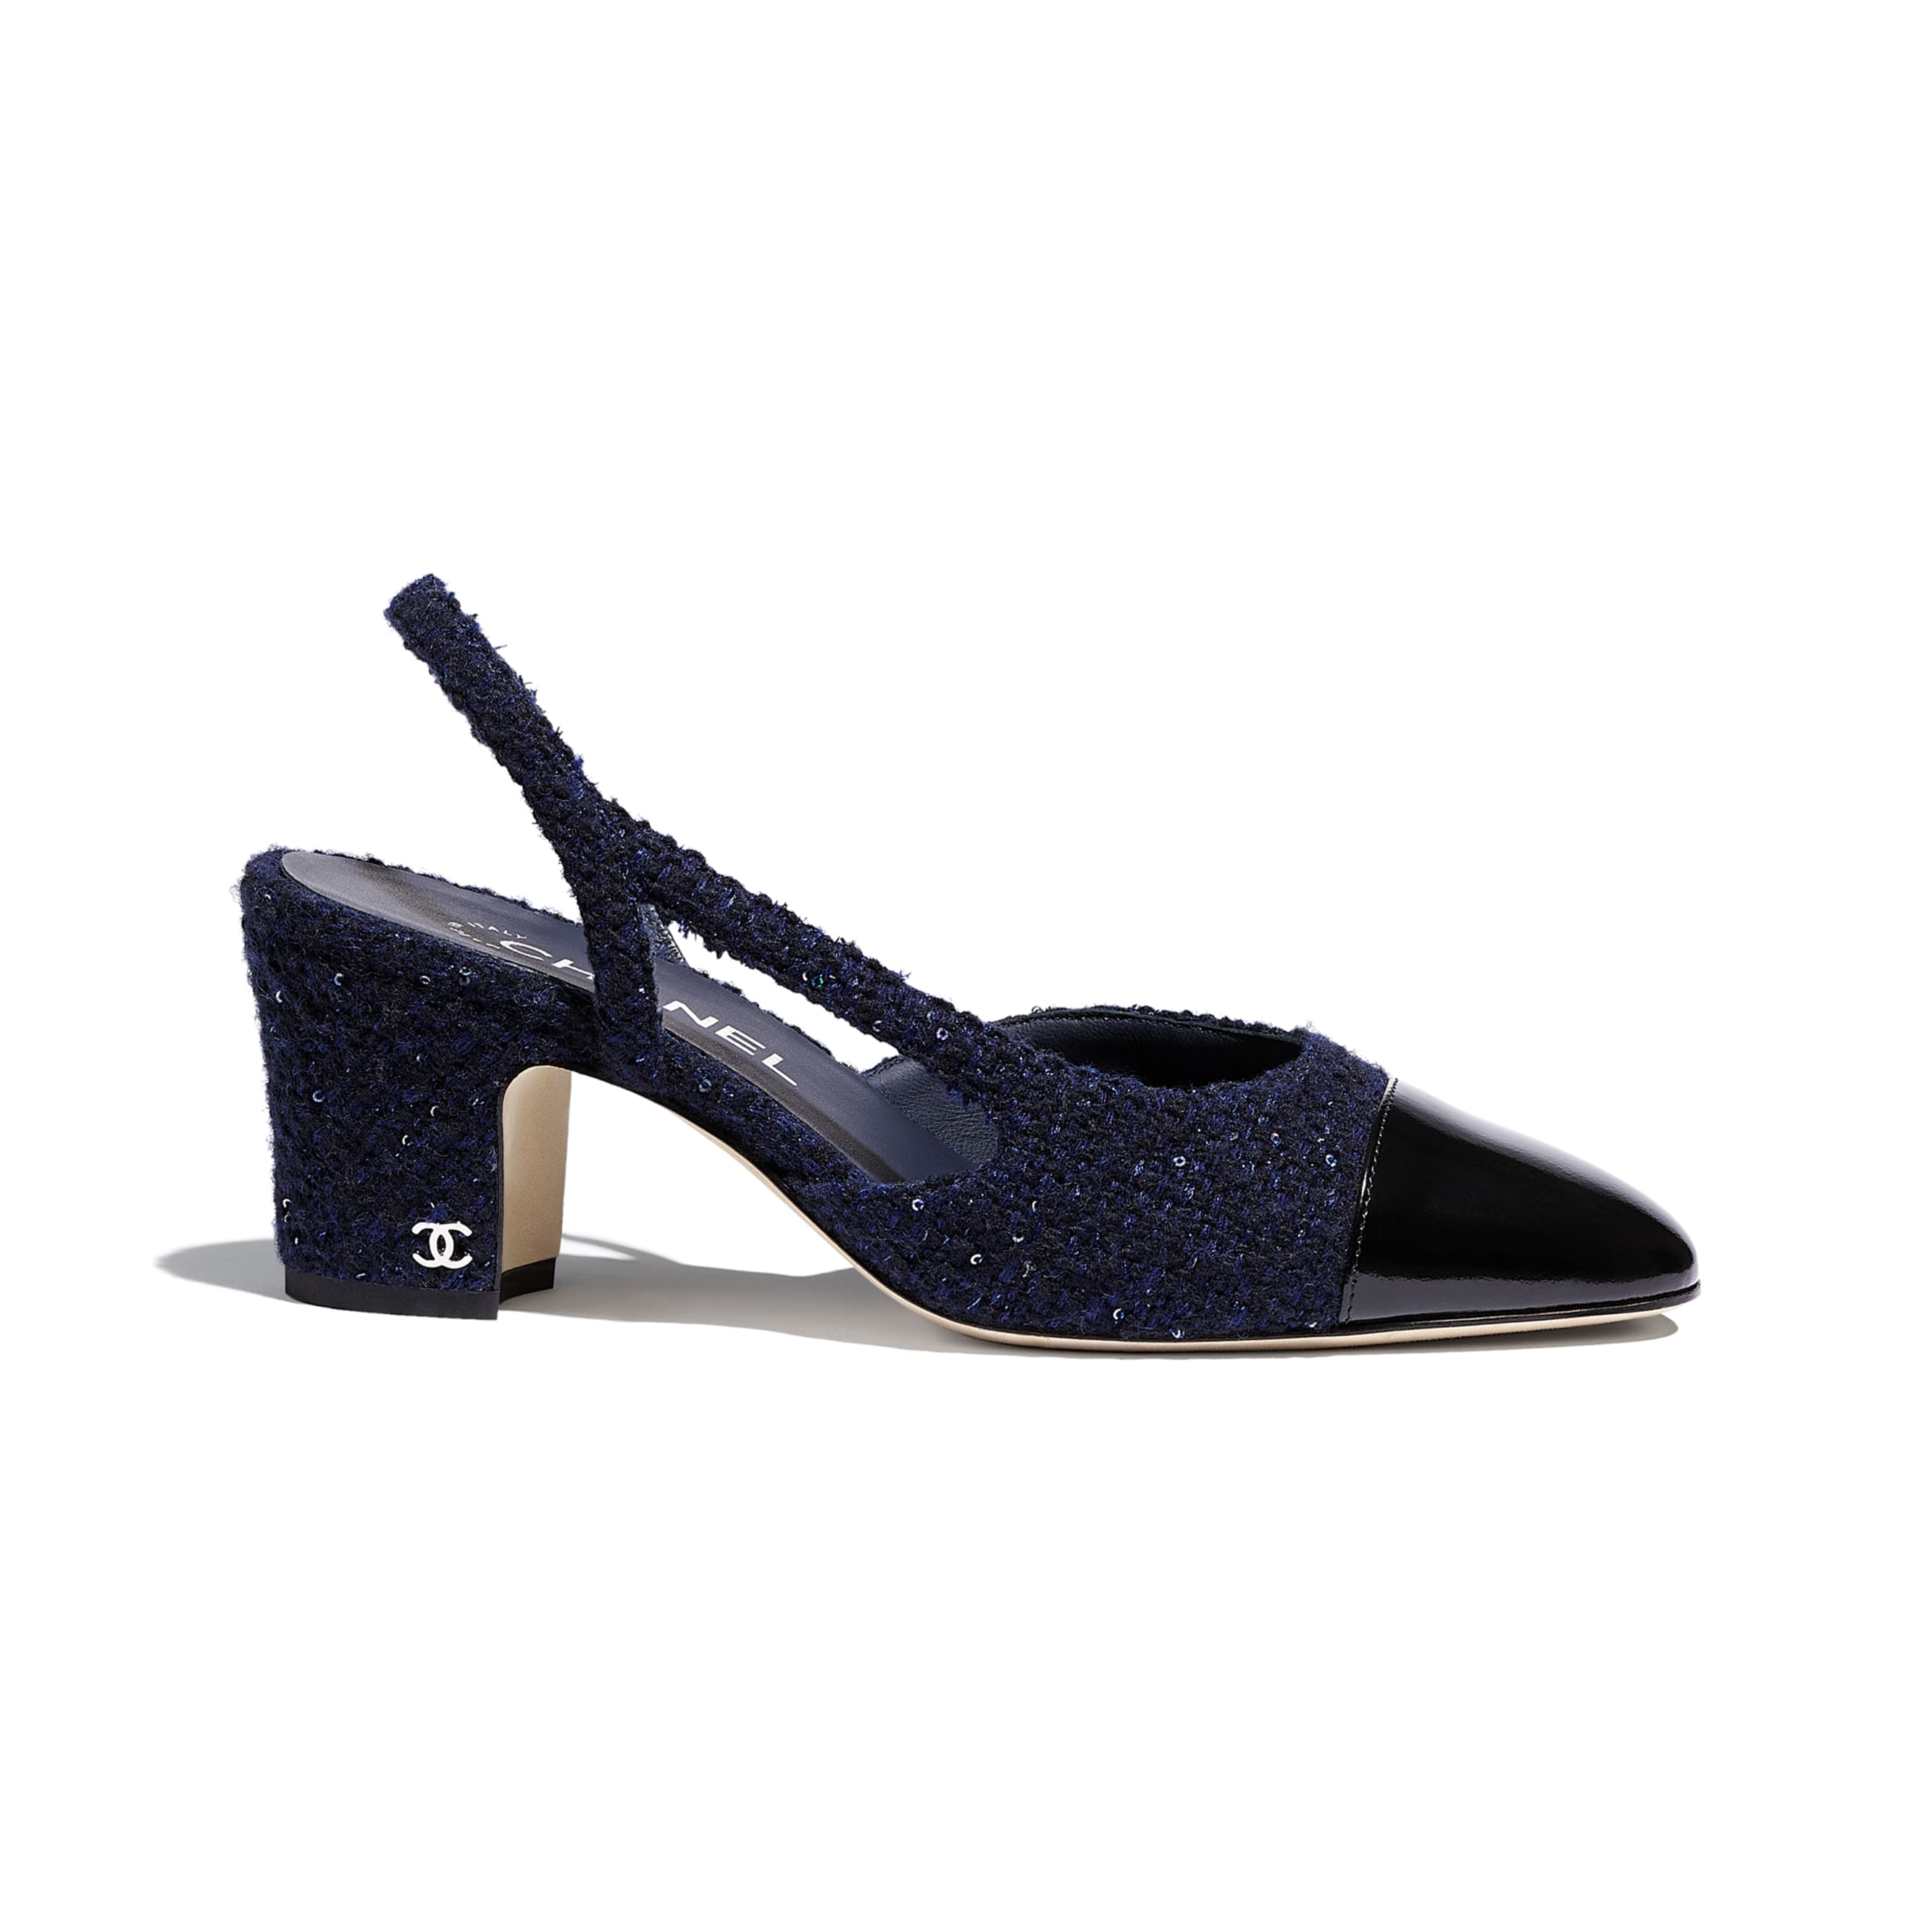 Sling-Back - Navy Blue & Black - Tweed & Calfskin - CHANEL - Default view - see standard sized version